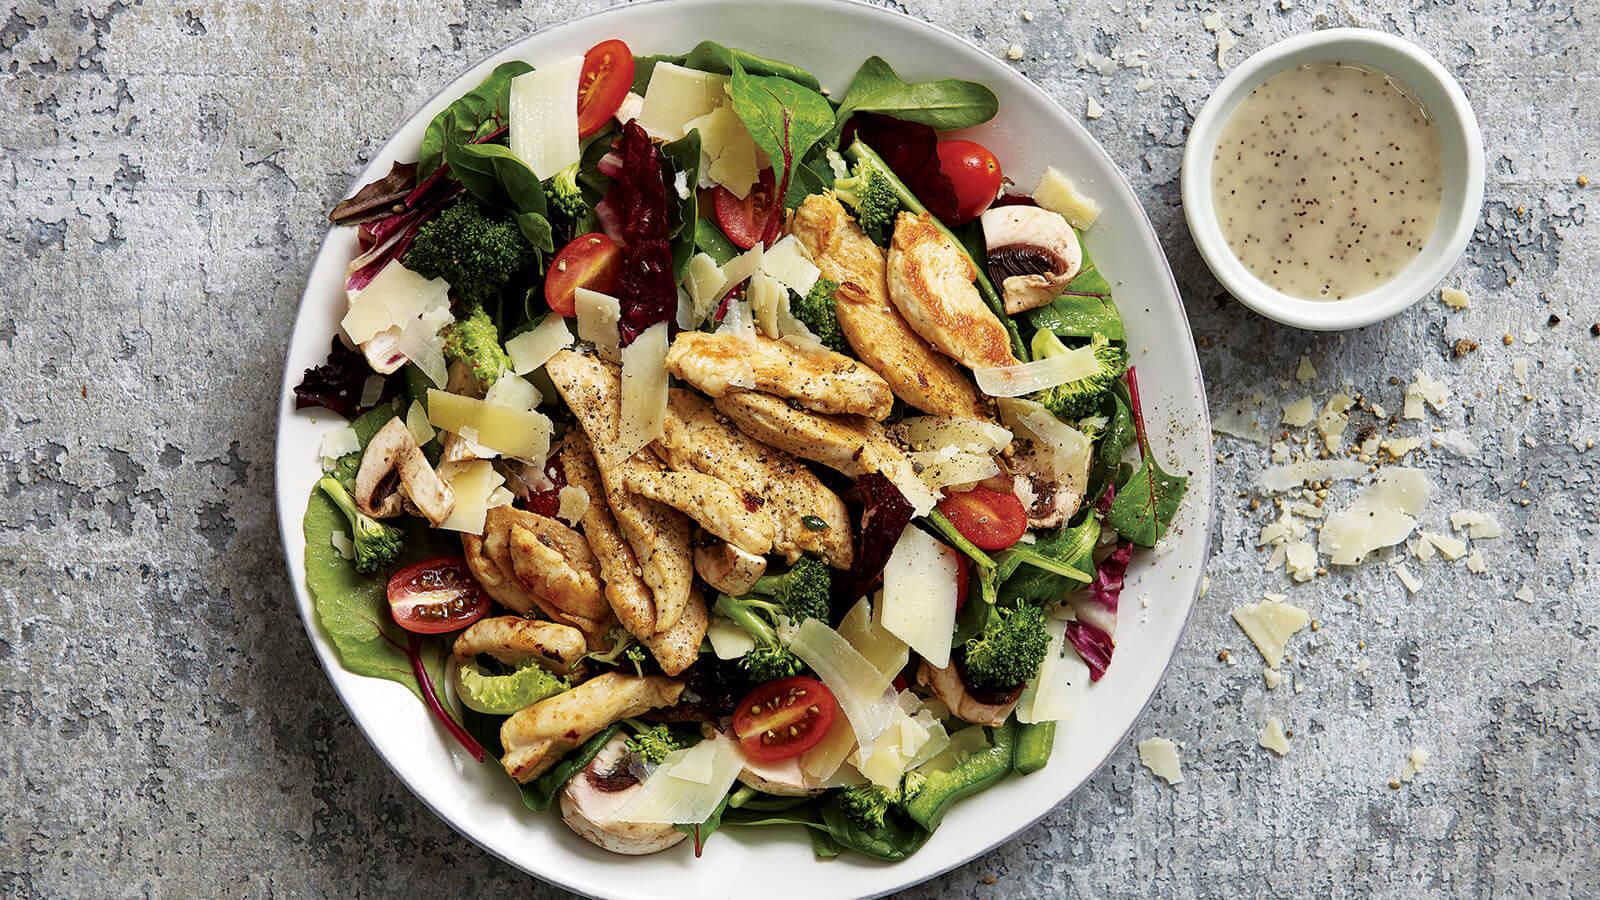 Warm Chicken Salad With Poppyseed Dressing Recipe The Fresh Market